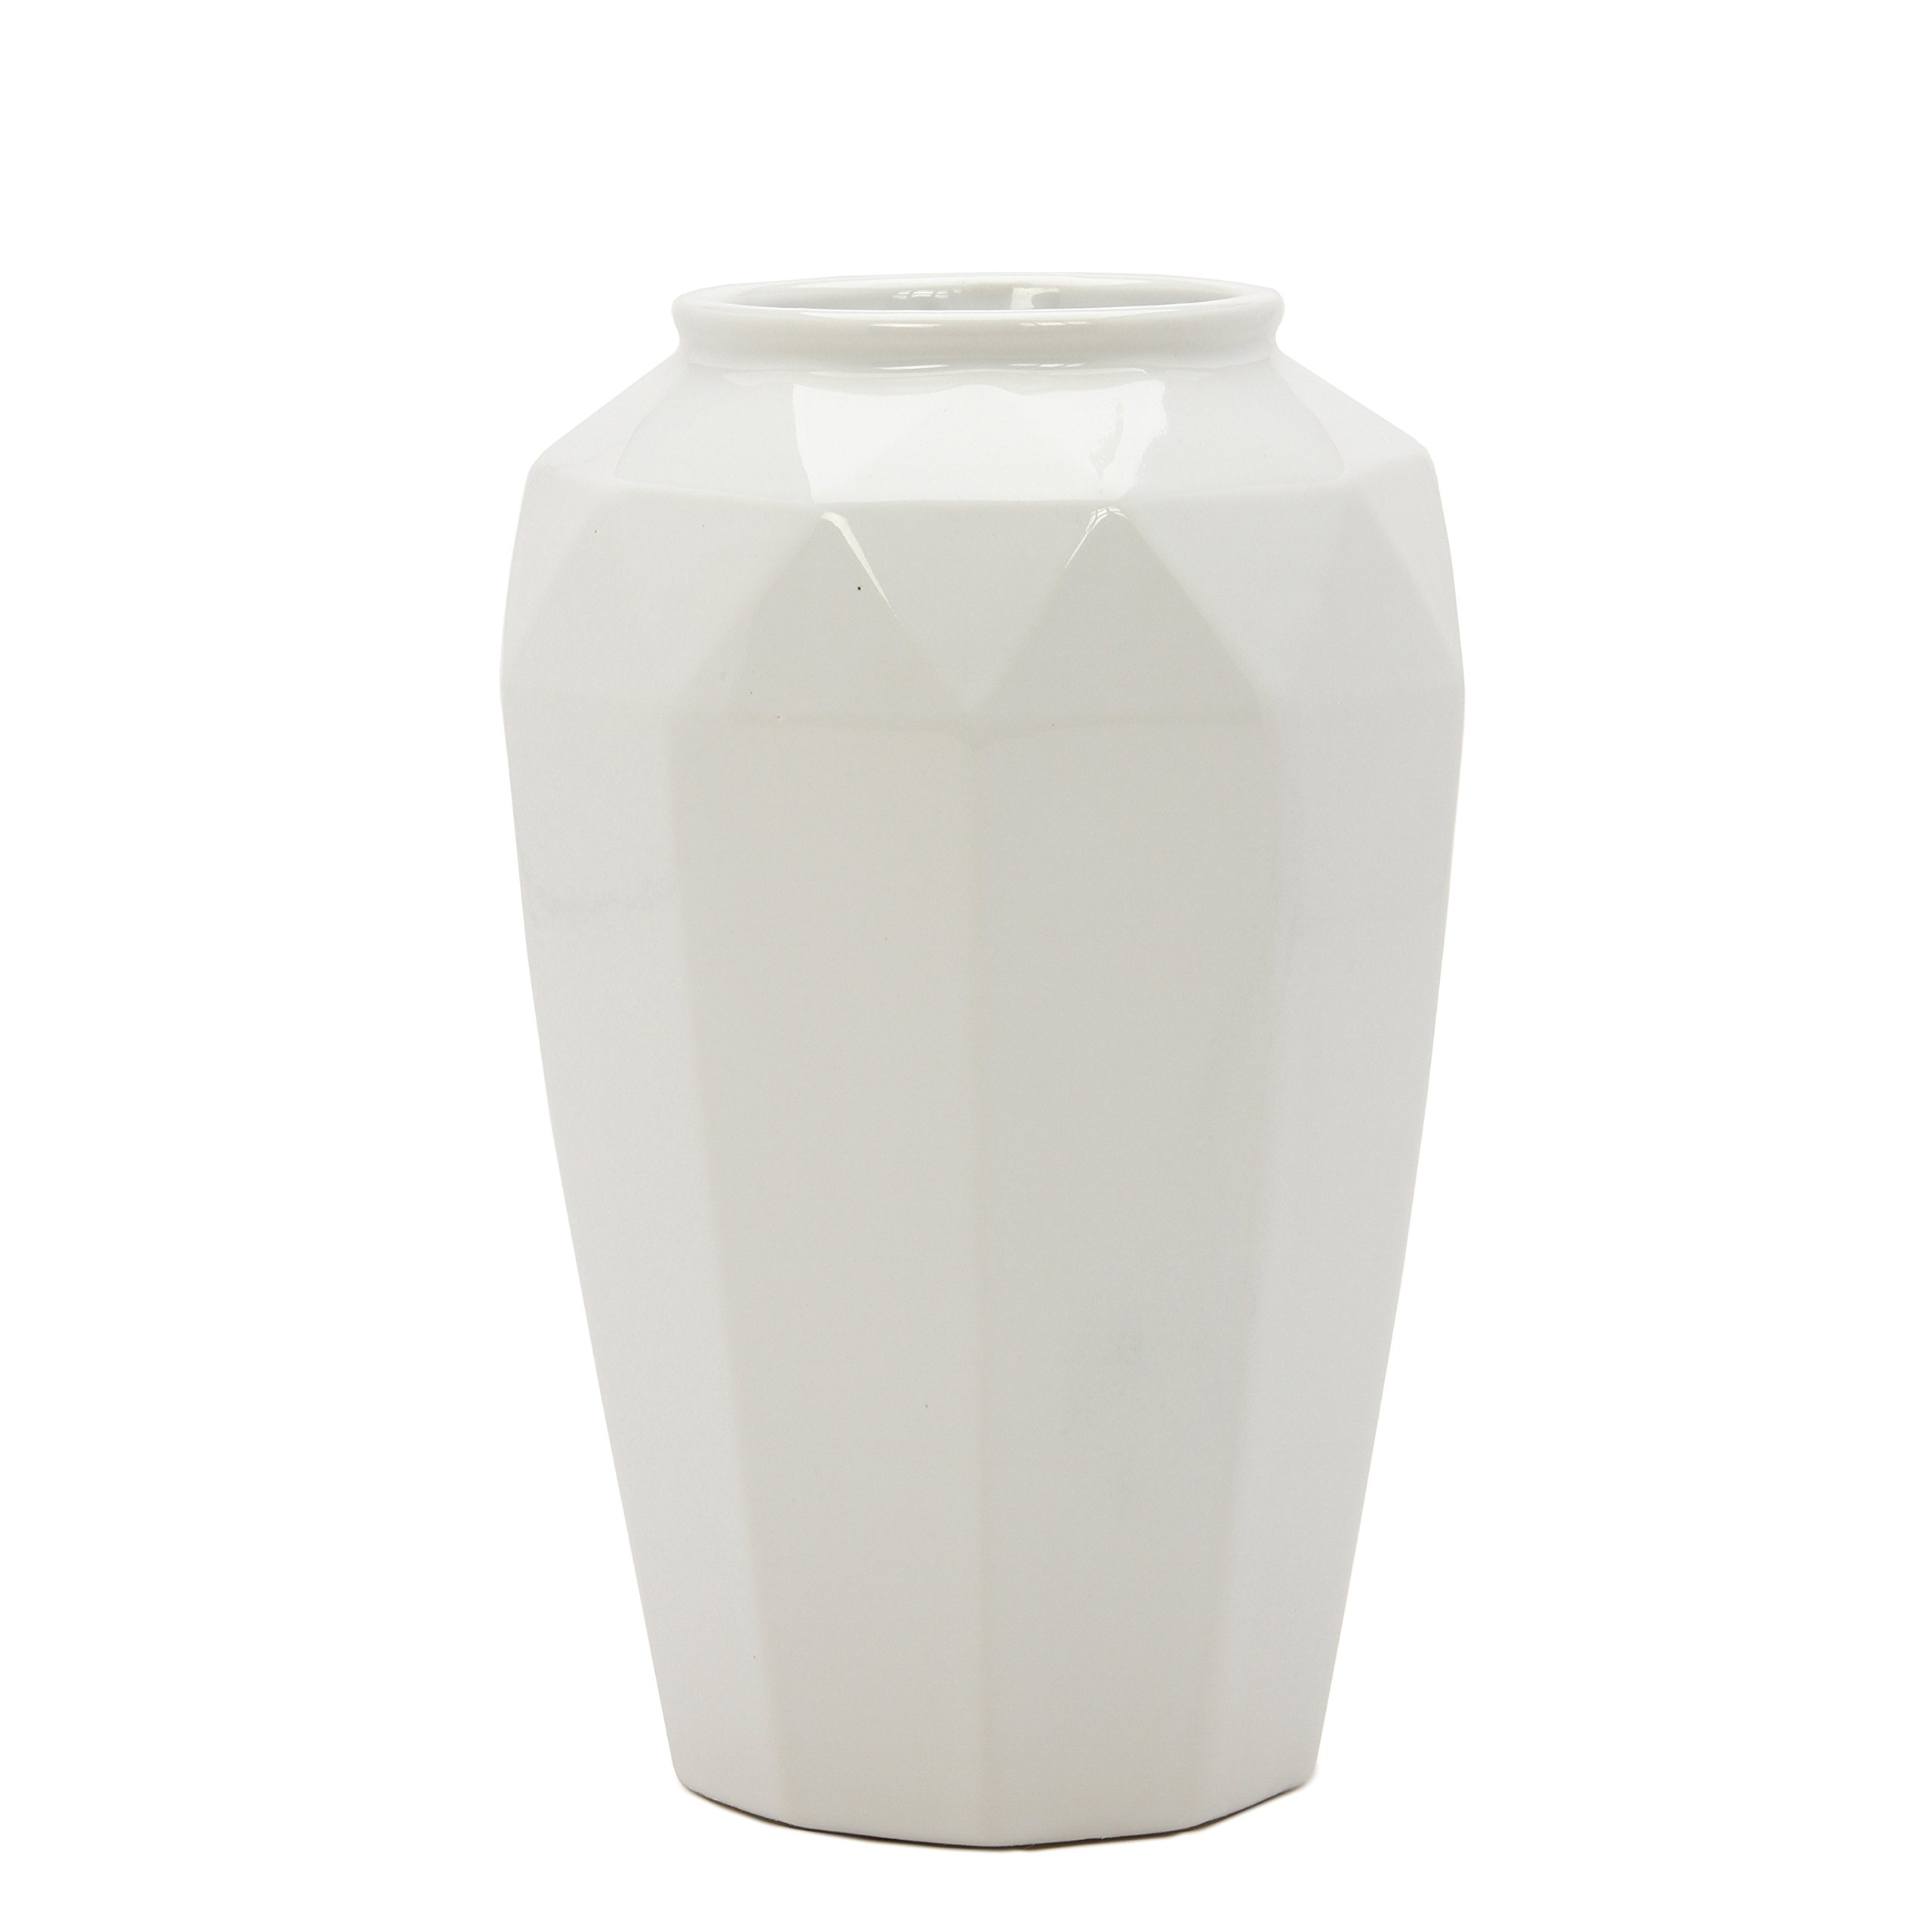 Hosley 8.5'' High, Geo Ceramic Rose Flower Vase - White. Ideal Gift for Home, Weddings, Party, Spa, Meditation, Home Office, Reiki, Meditation O5